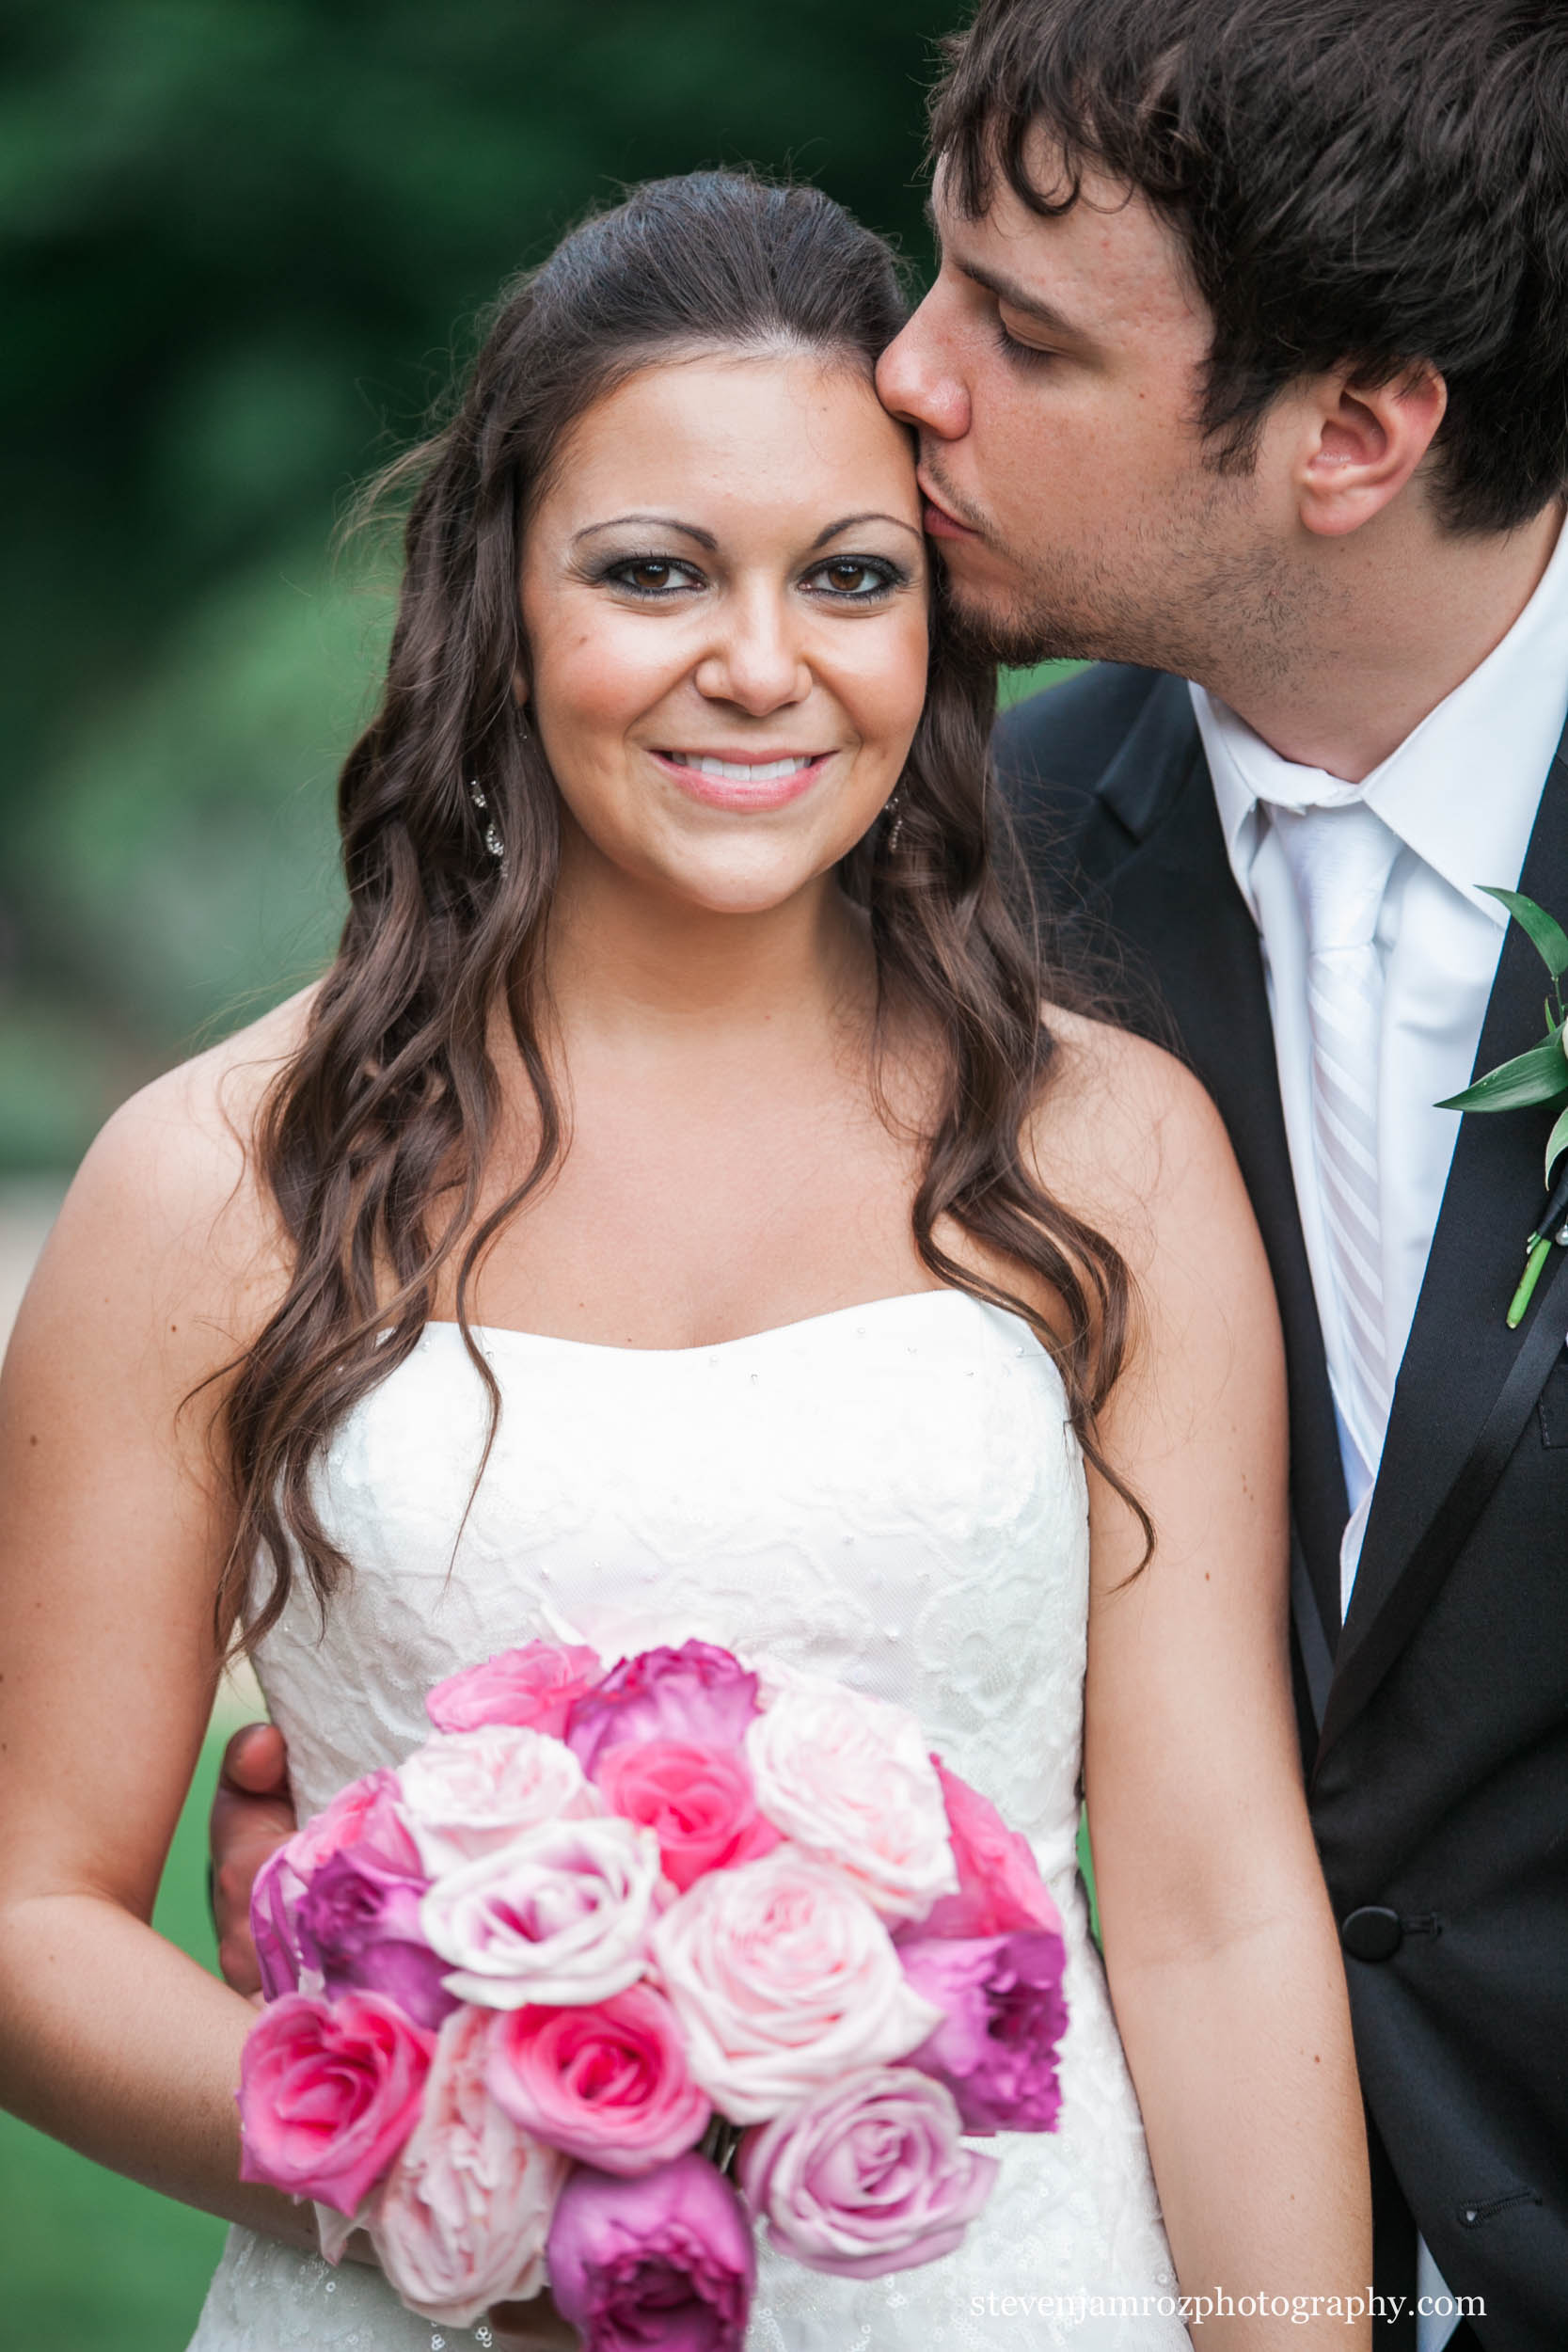 kiss-on-cheak-wedding-steven-jamroz-photography-0011.jpg